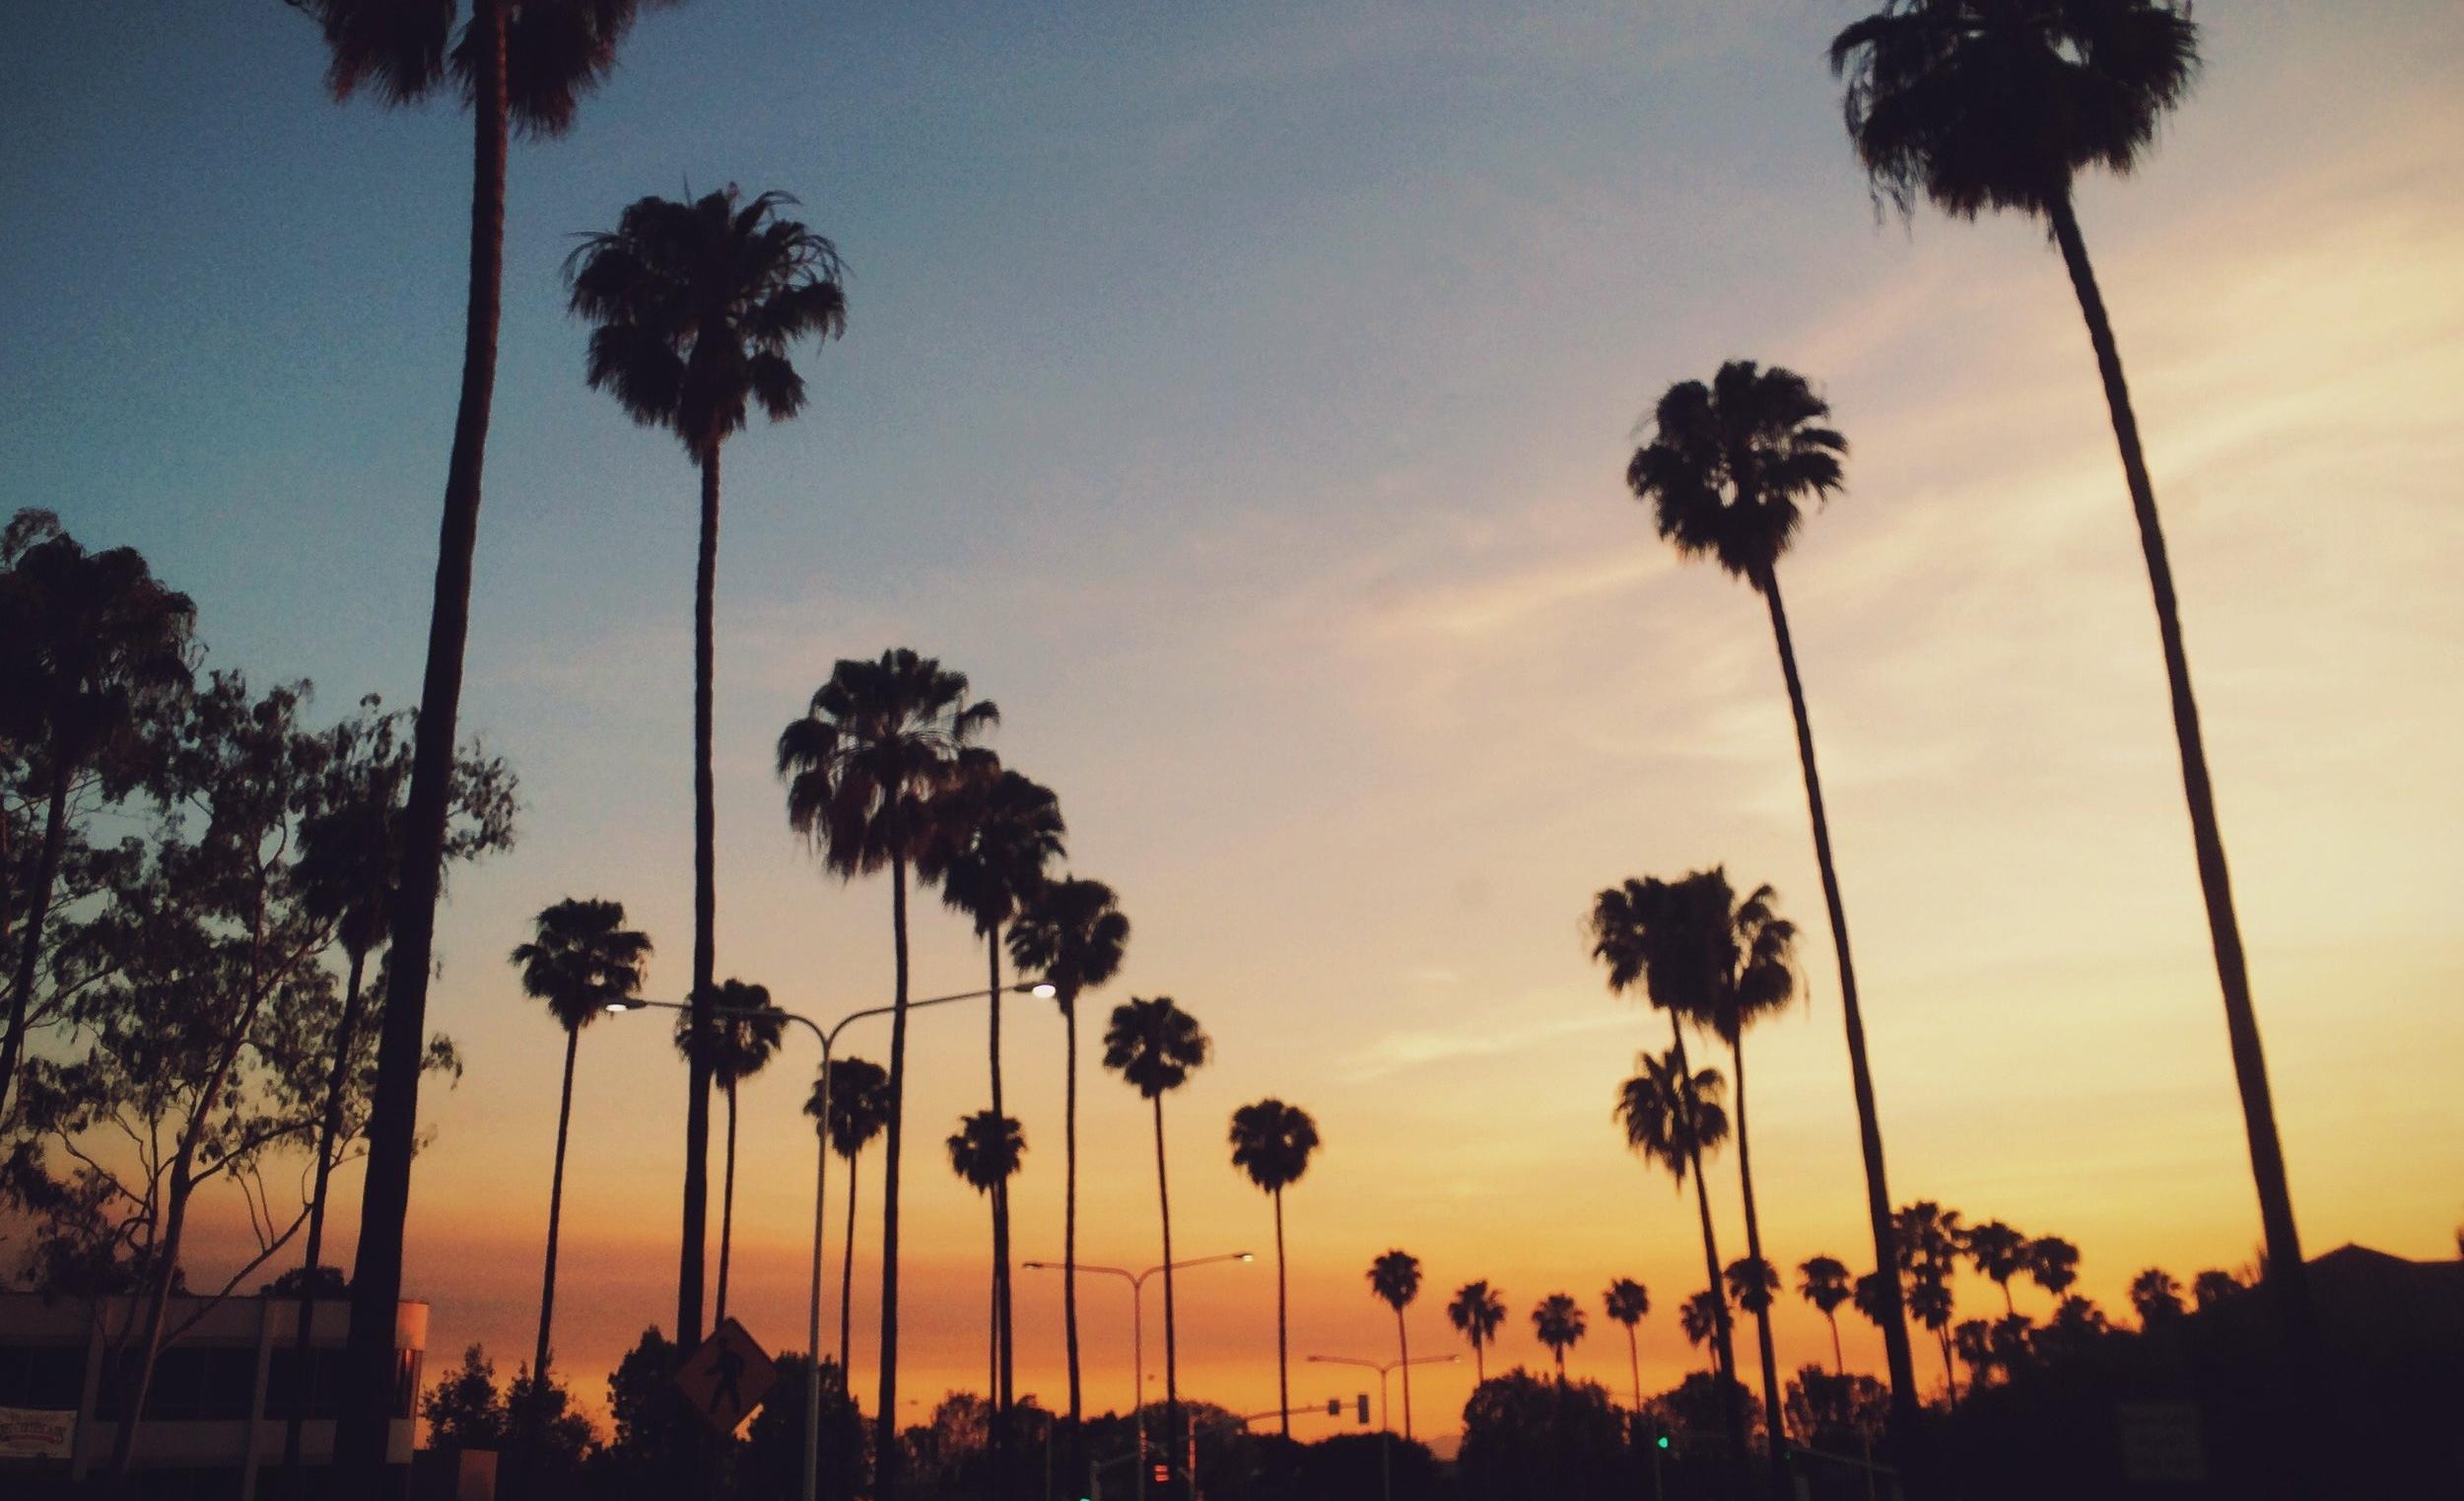 LOS ANGELES - SUMMER 2019